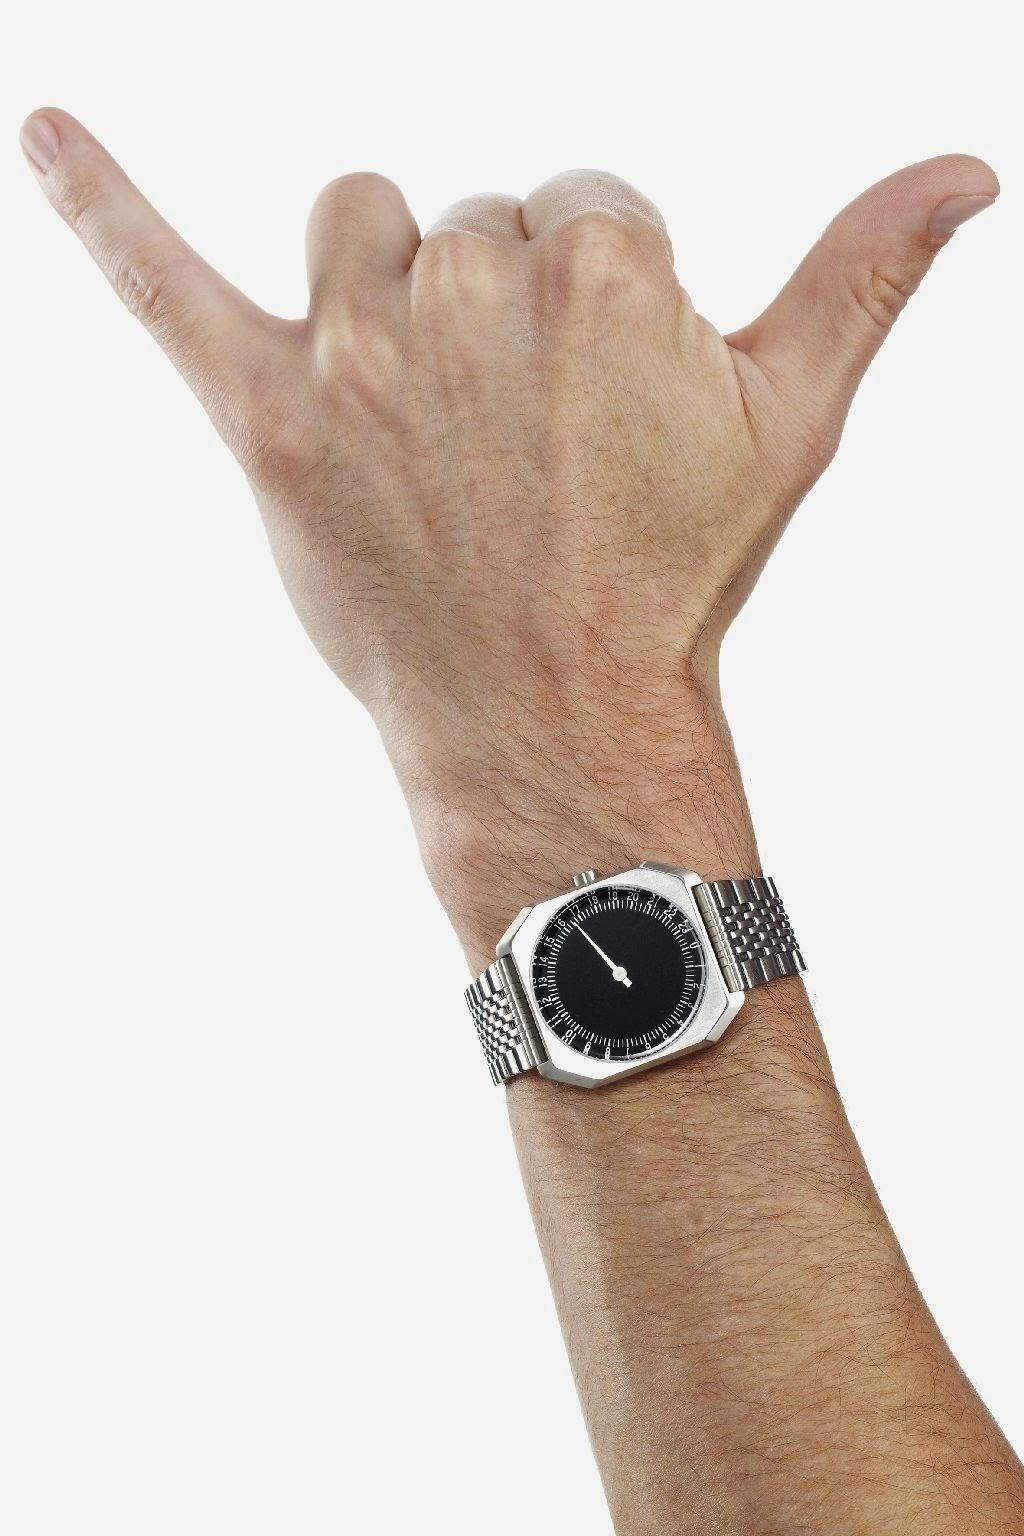 Slow Watch wrist shot